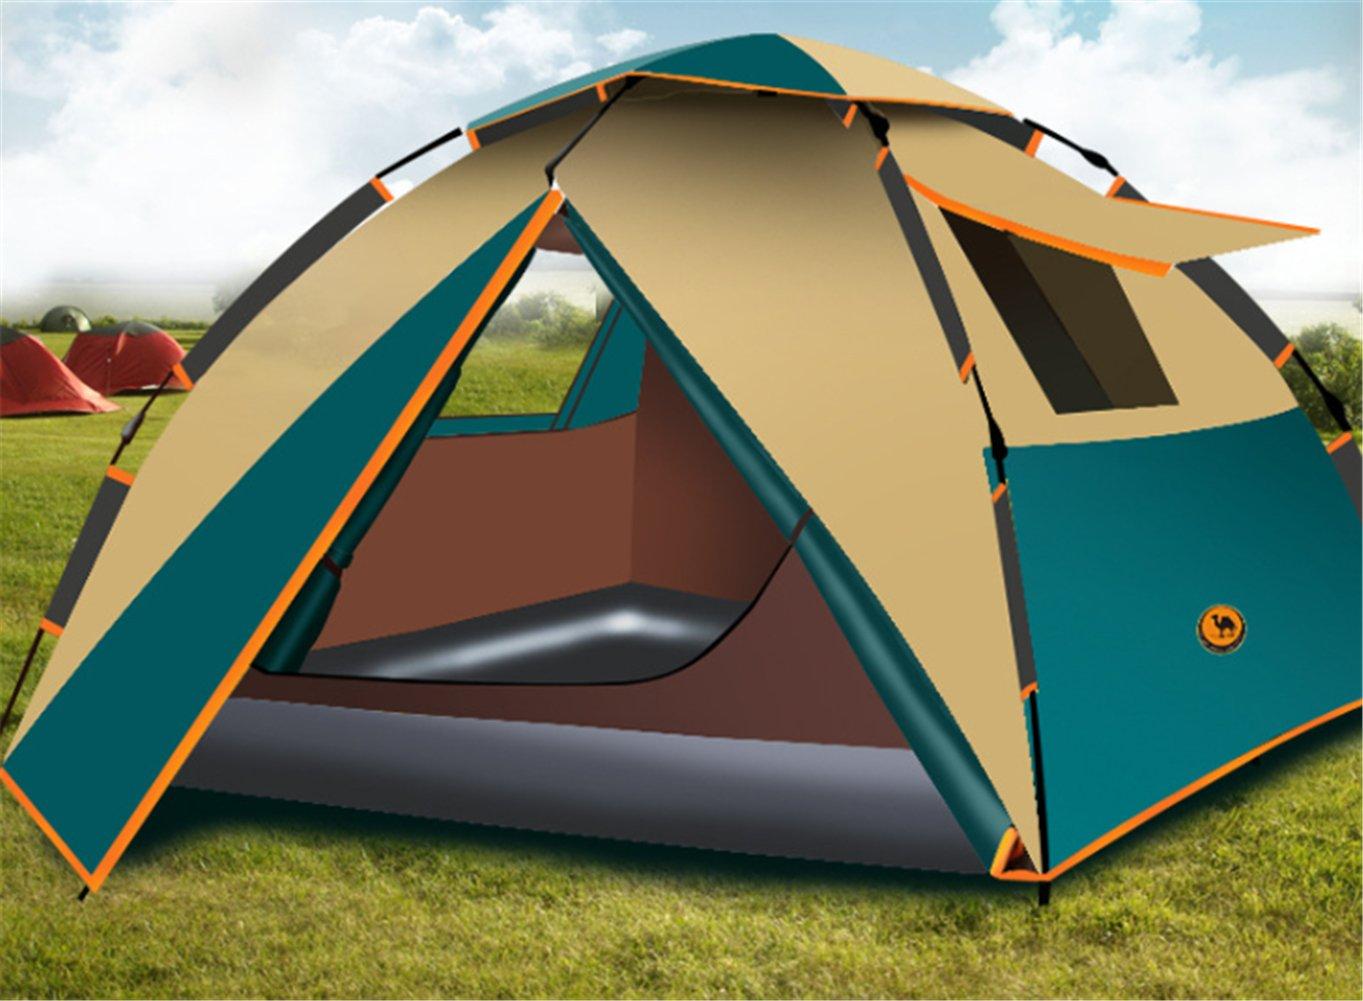 Yeying123 3-4 Personen Double LayeROT Camping Zelt Wasserdicht, Anti-Insect Für Camping/Wandern,Beige